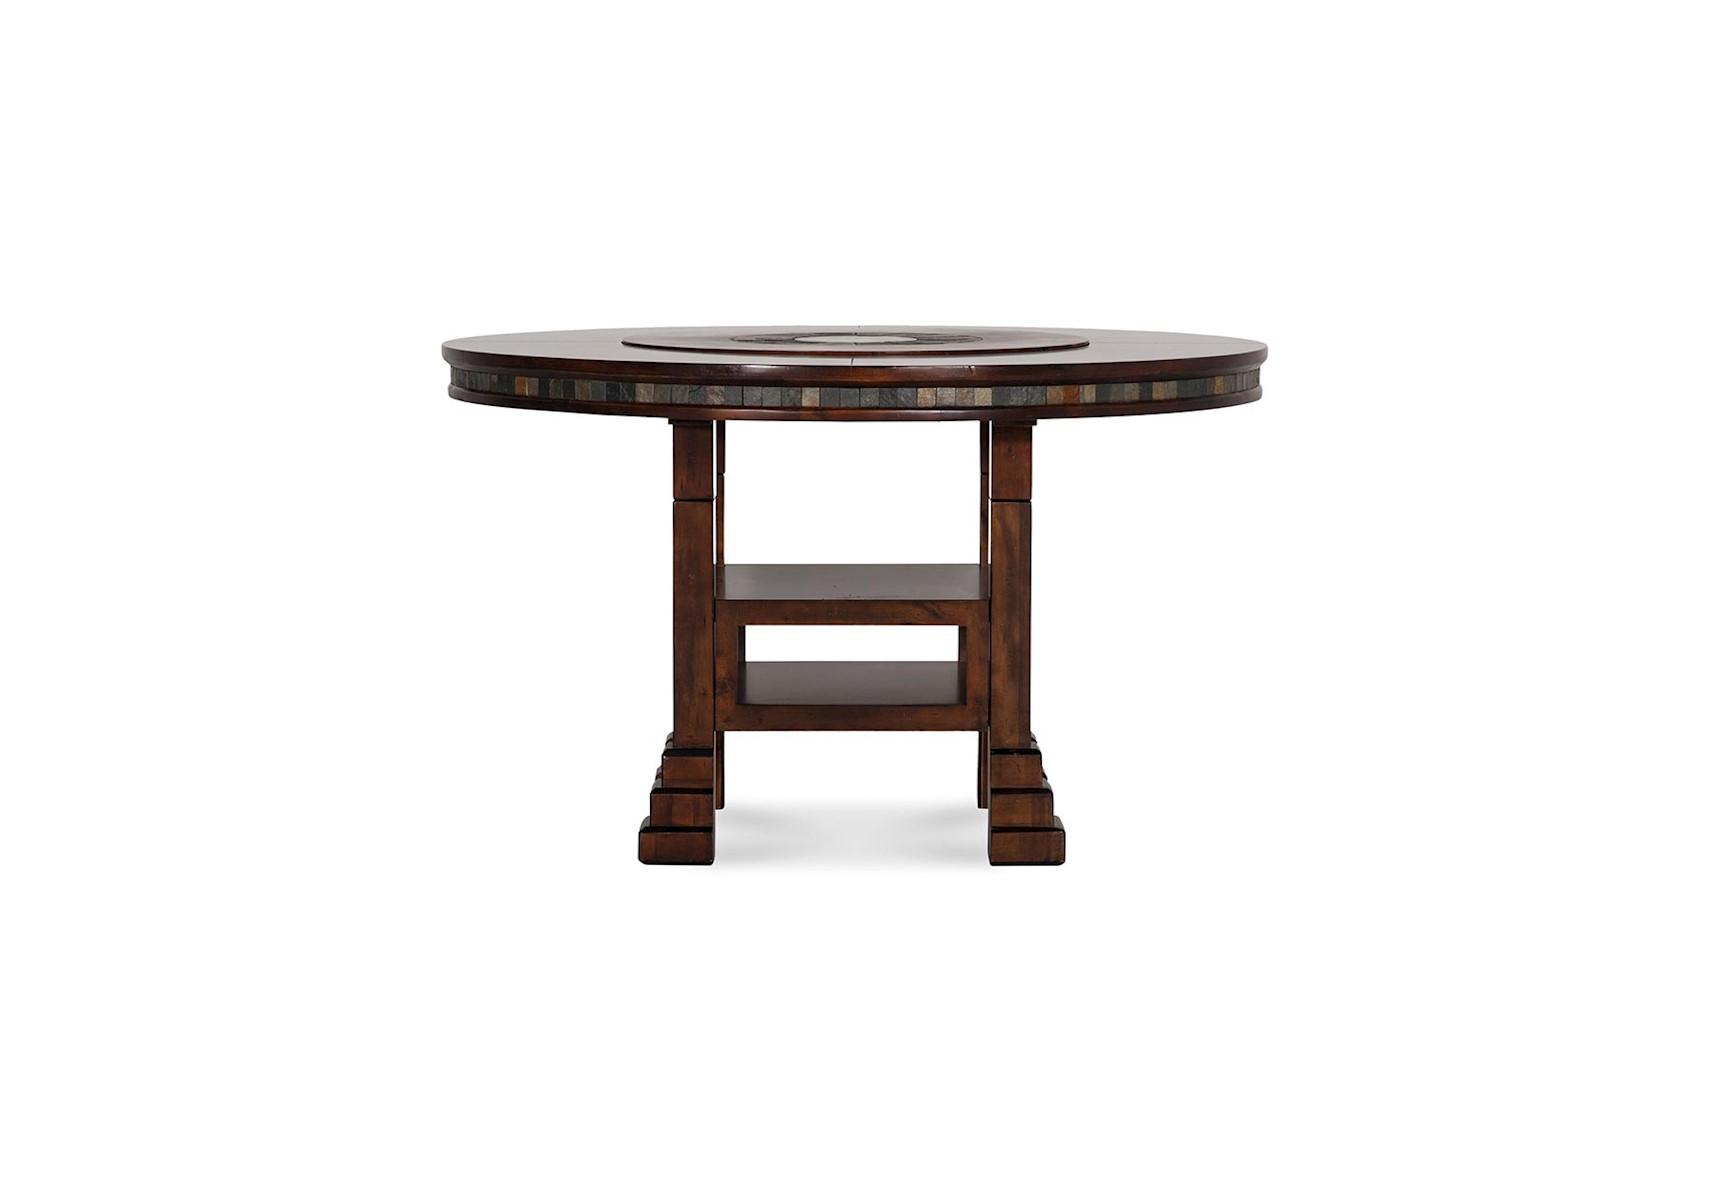 Santa Fe Adjustable Height Round Table